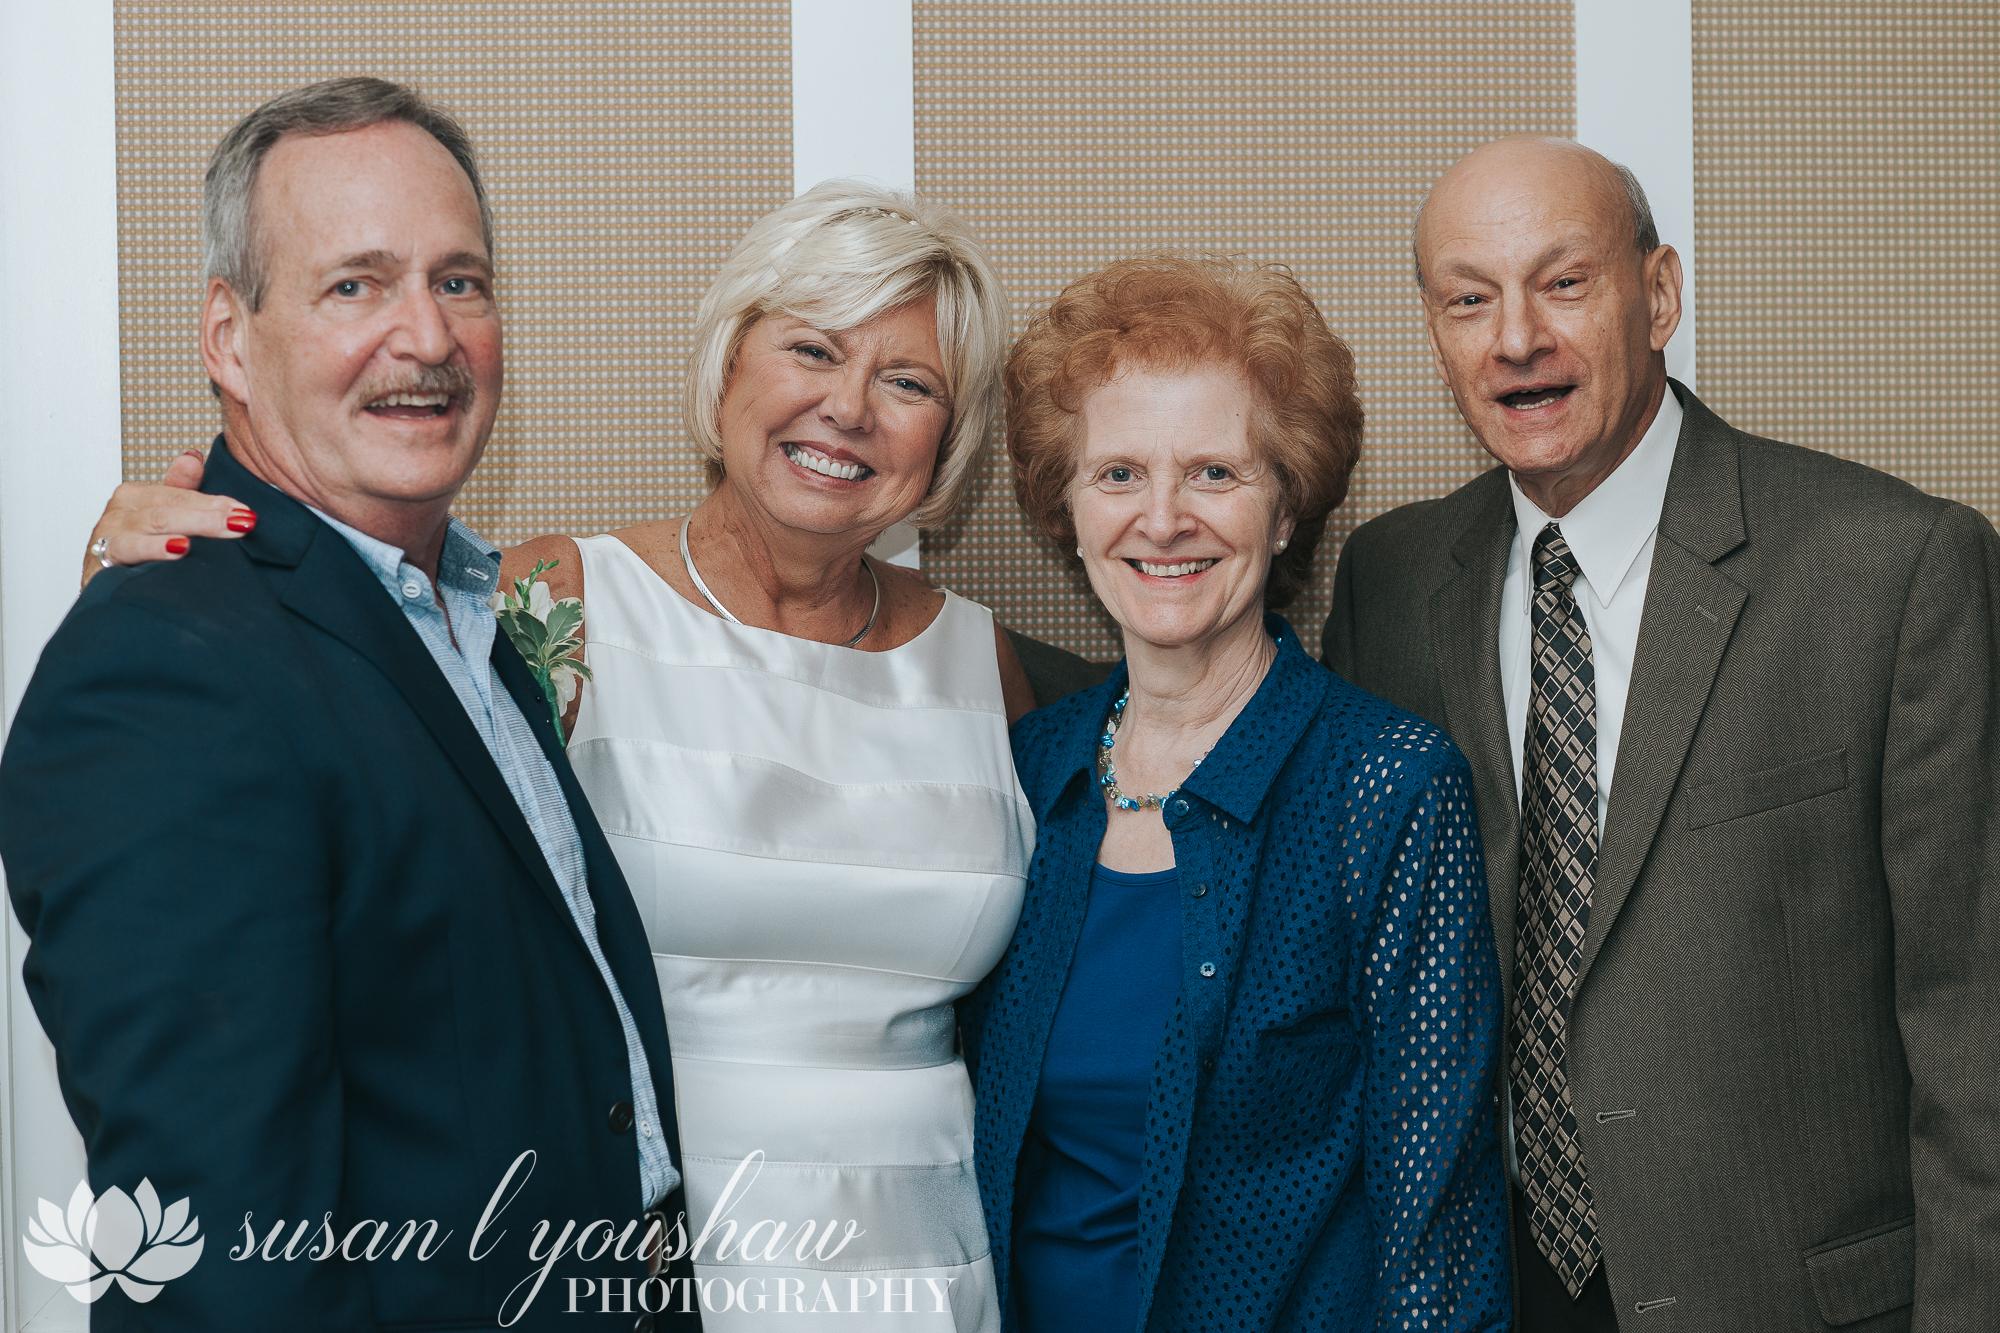 BLOG Carolyn Adams and Jim McCune 07-04-2018 SLY Photography-144.jpg